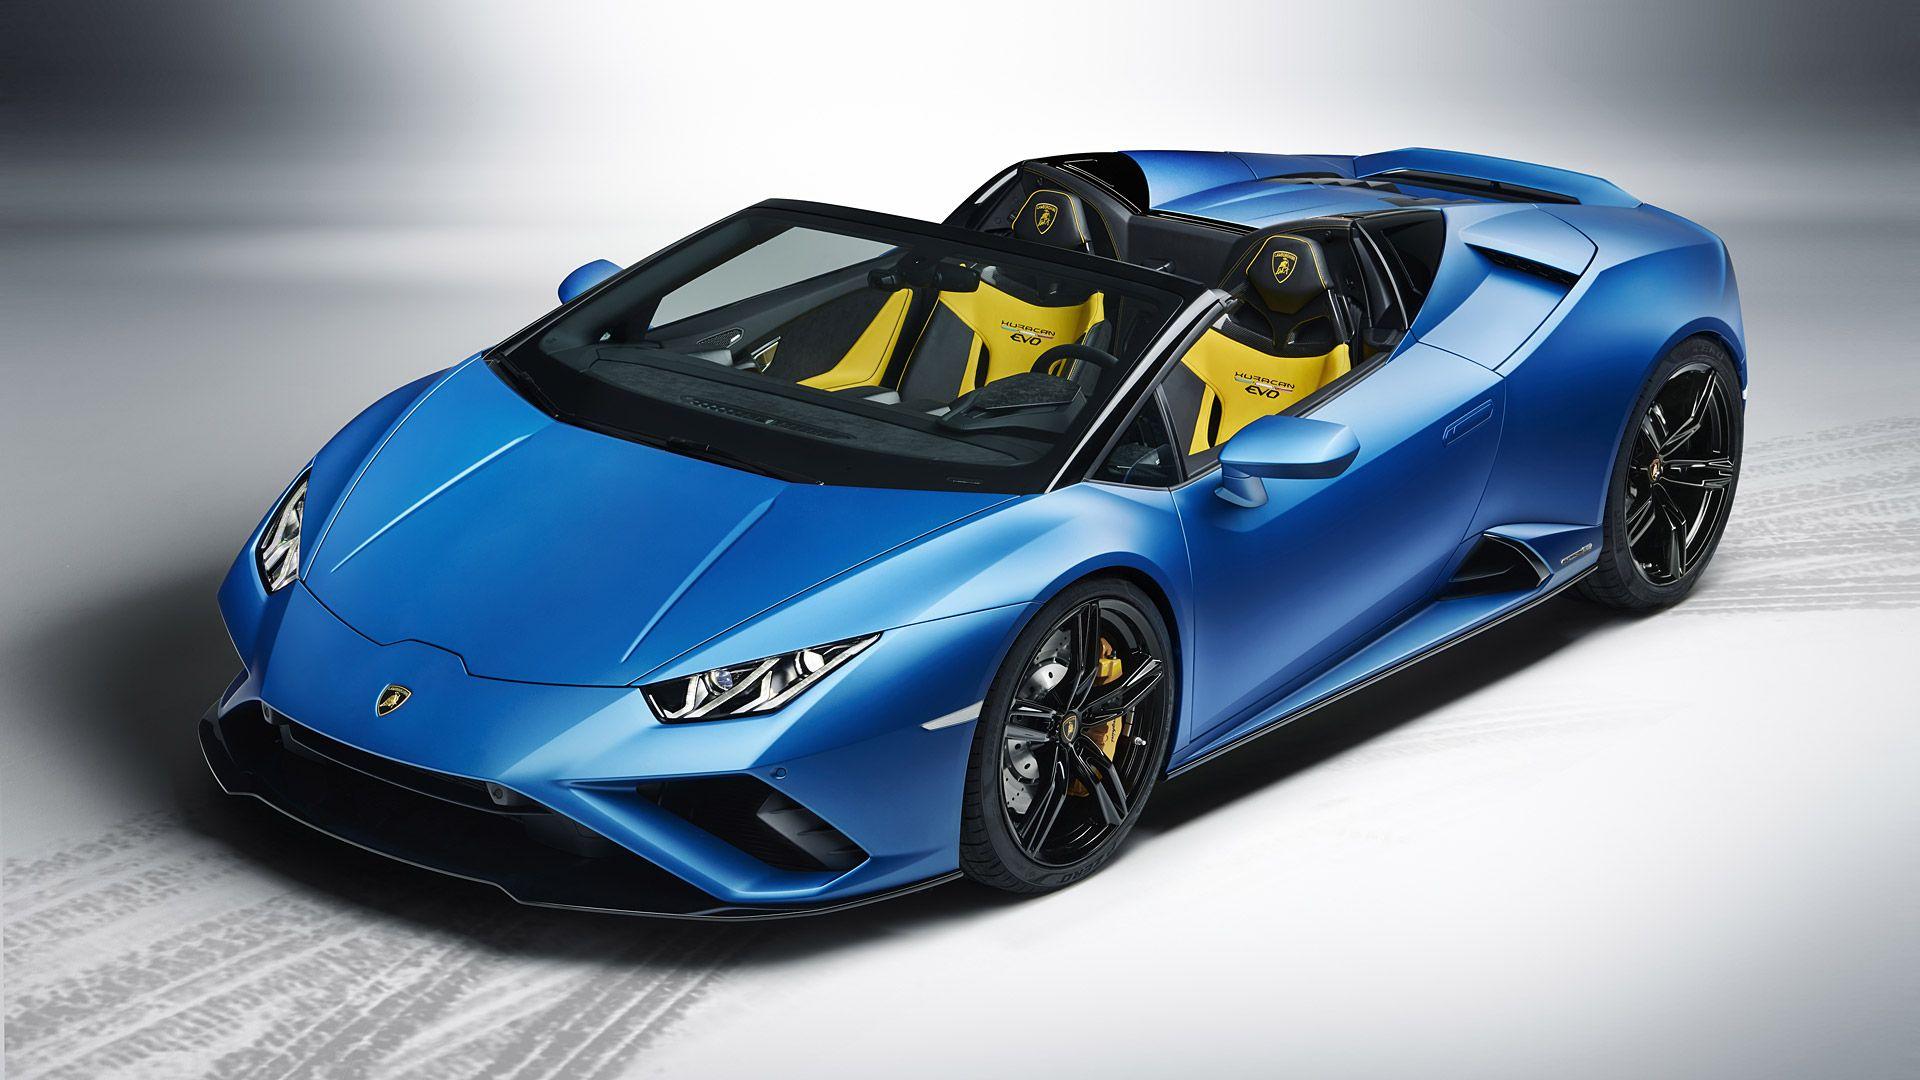 2021 Lamborghini Huracan Evo Rwd Spyder In 2020 Lamborghini Huracan Super Cars Rear Wheel Drive